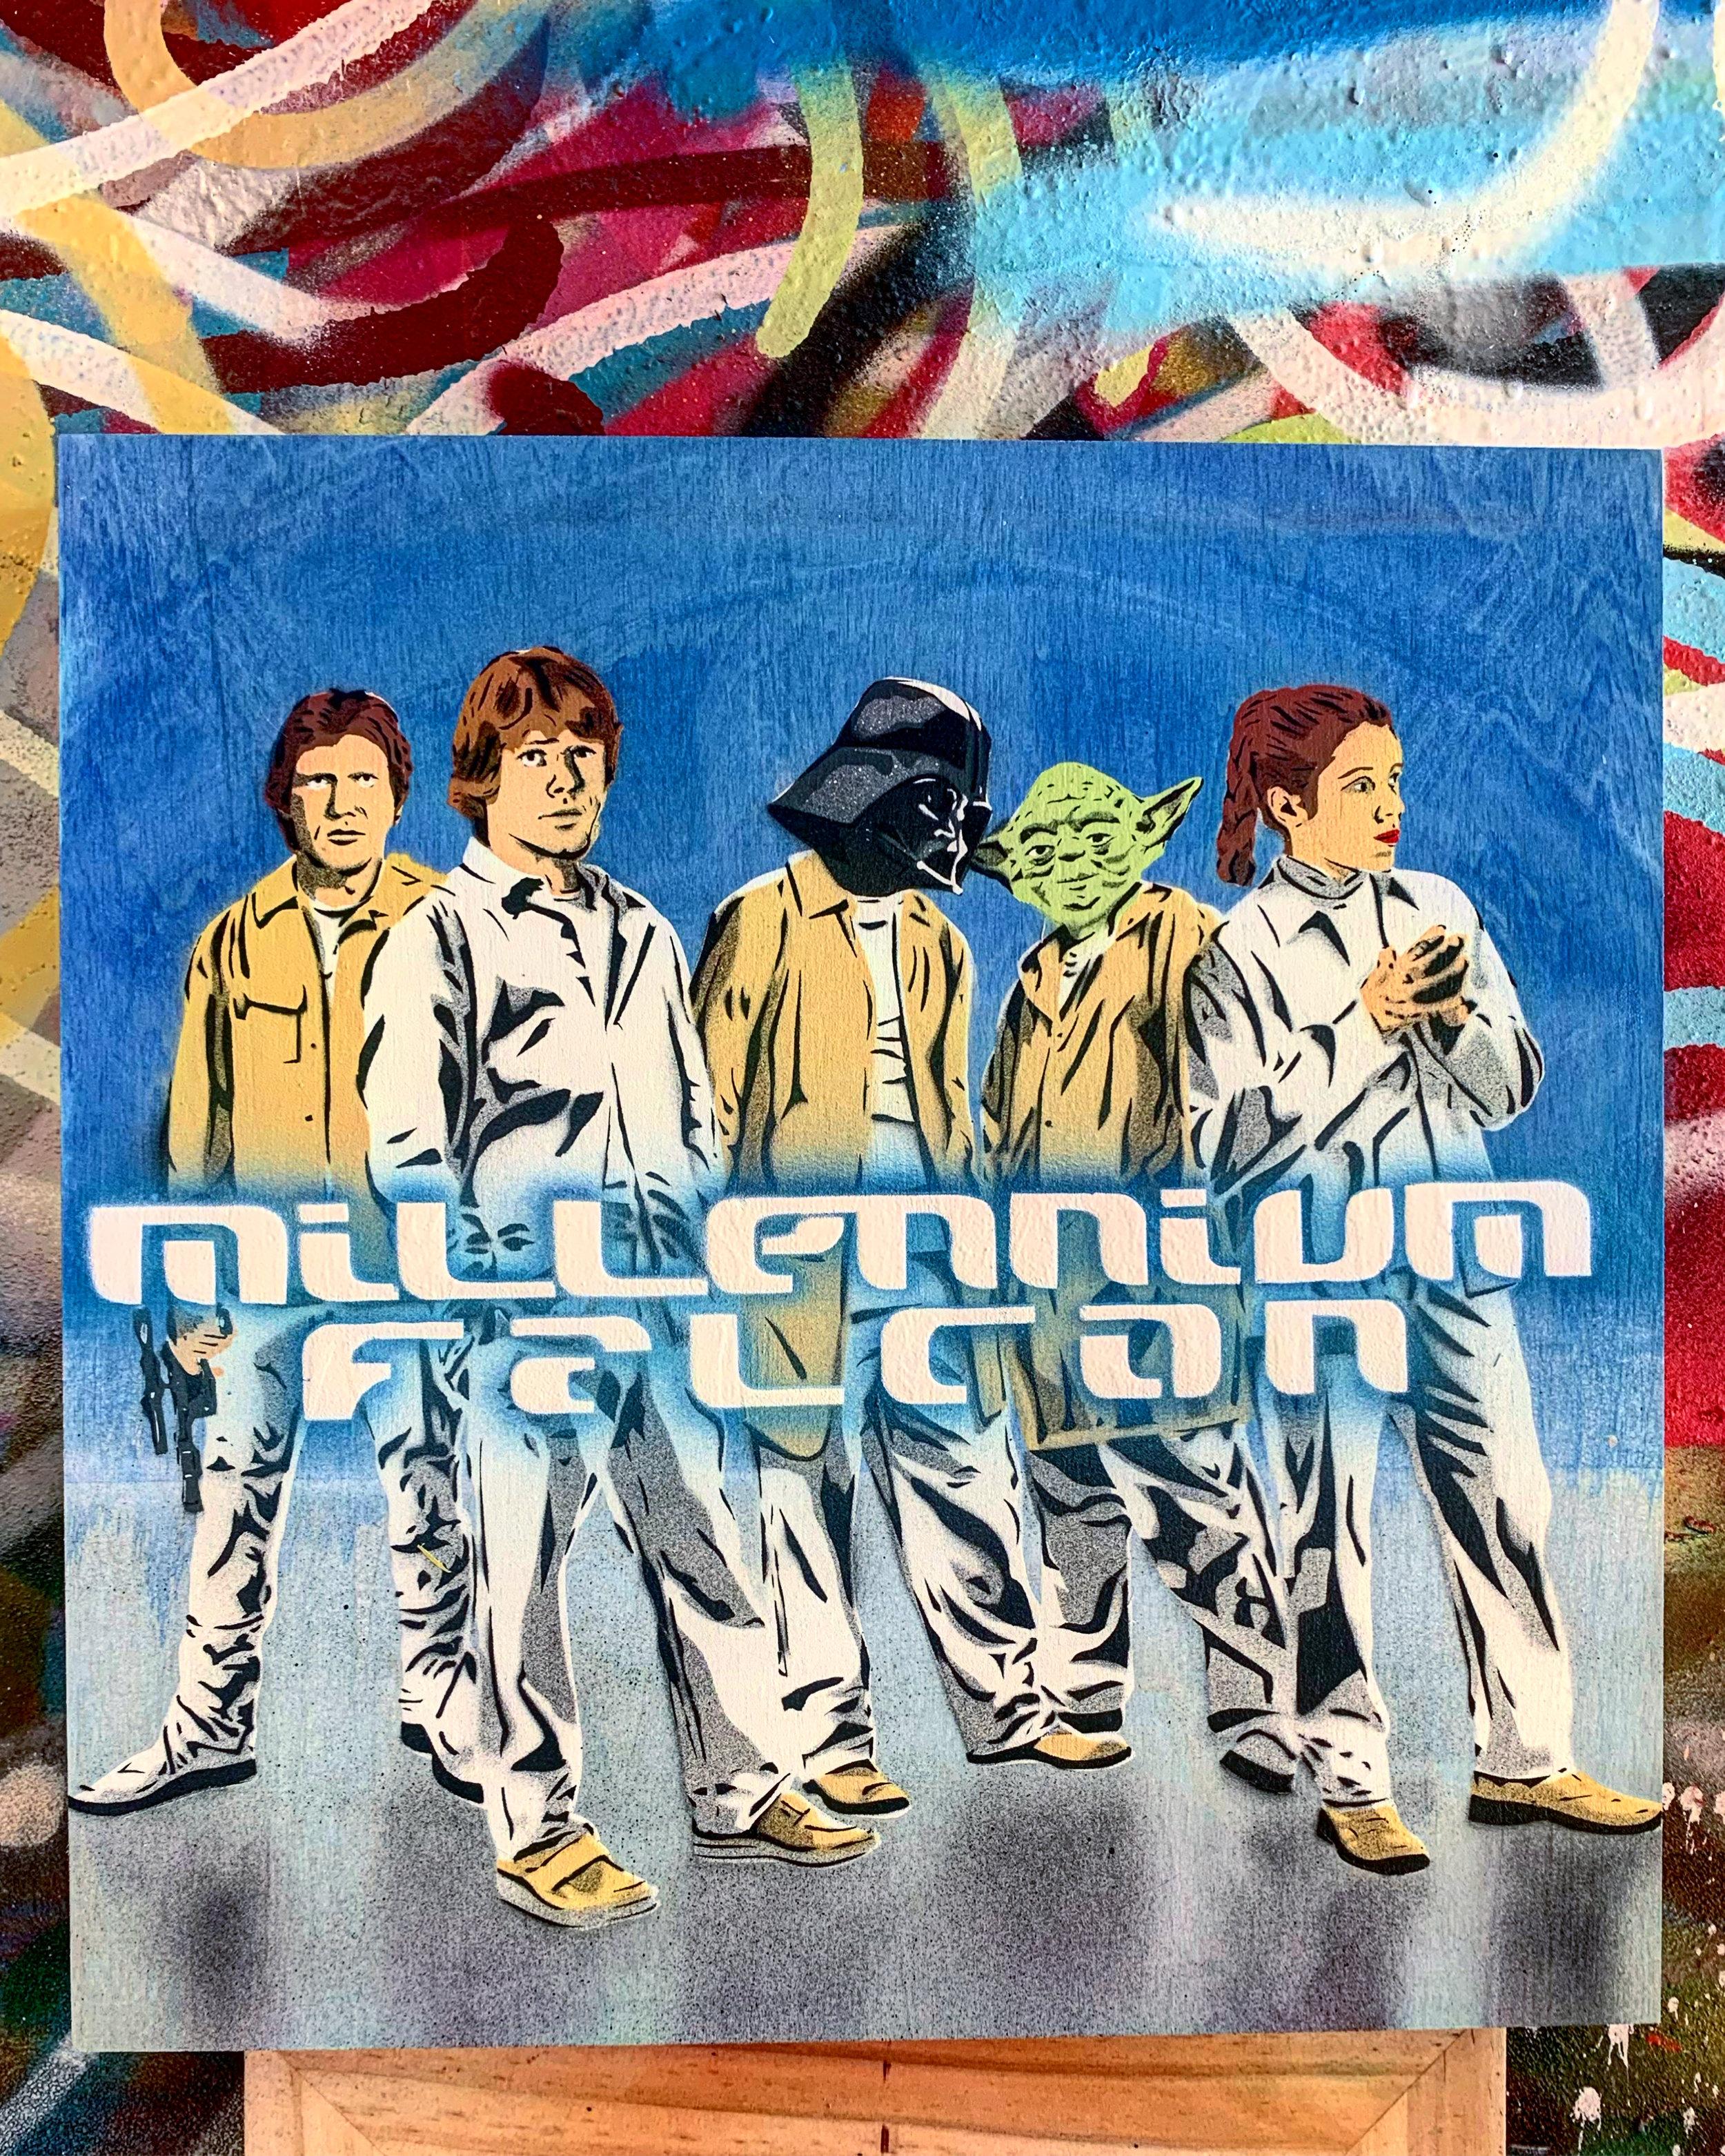 The Empire Strikes Backstreet Boys